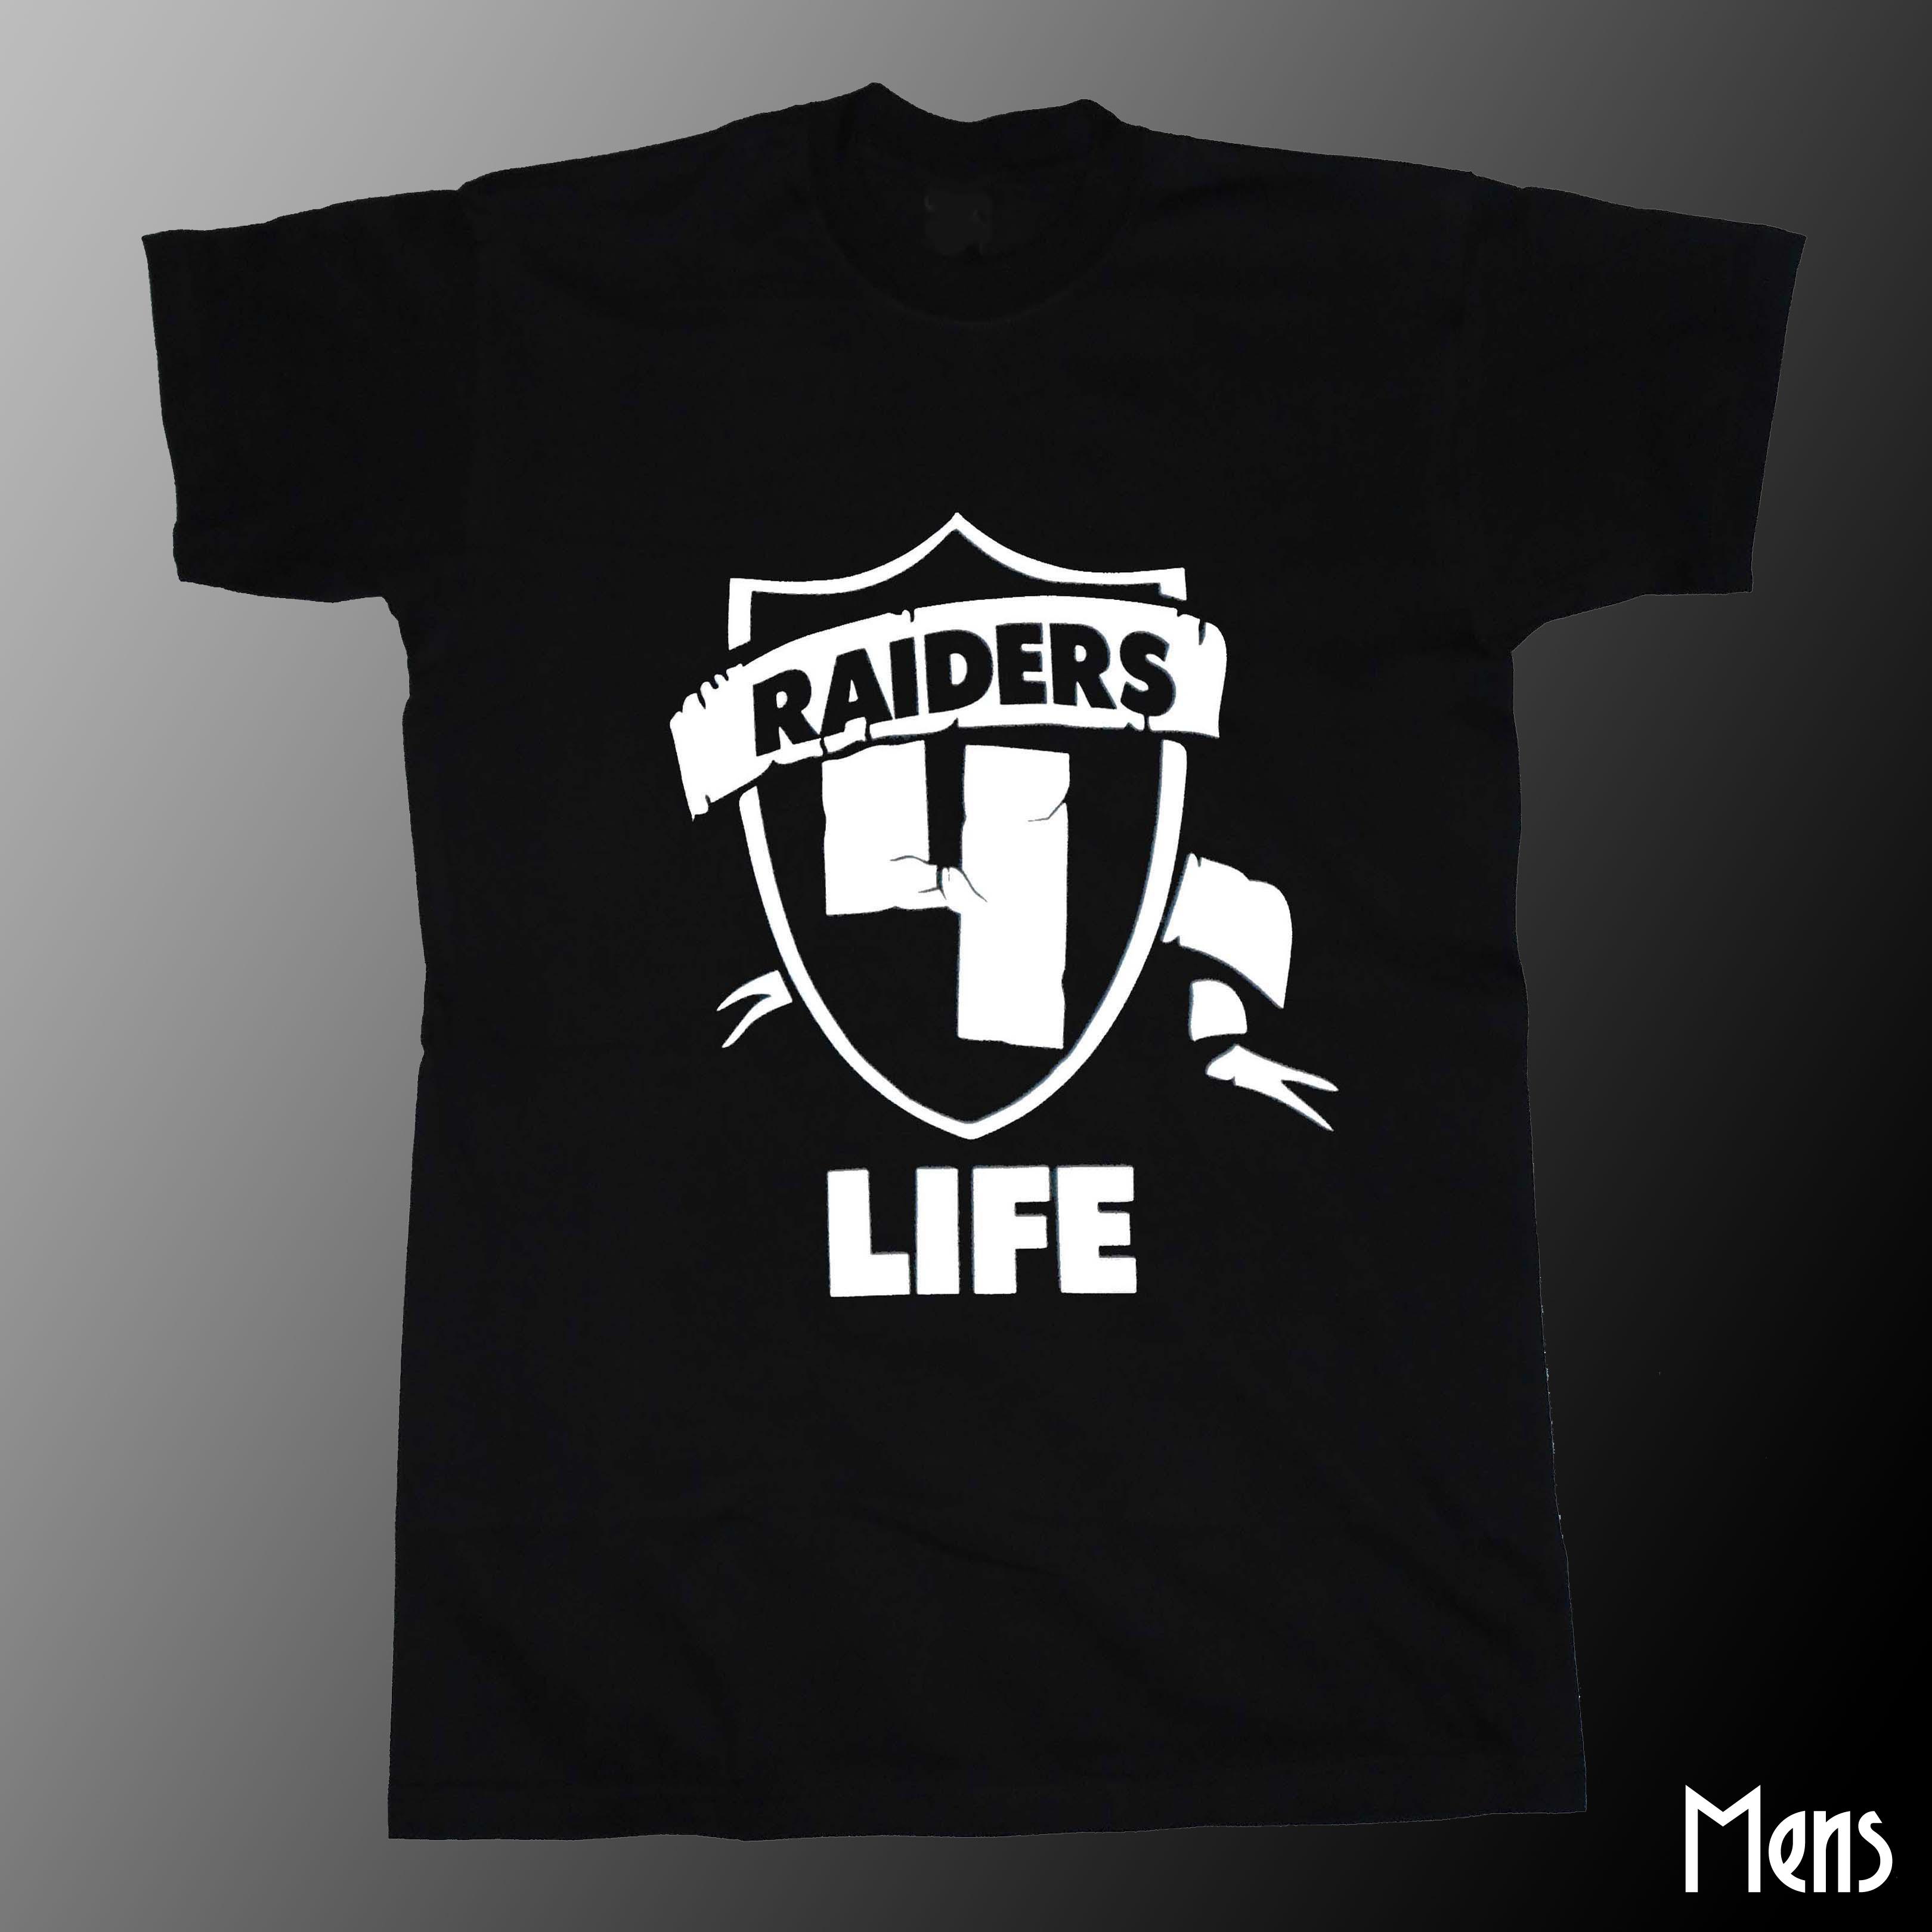 black hole raiders shirts - photo #34